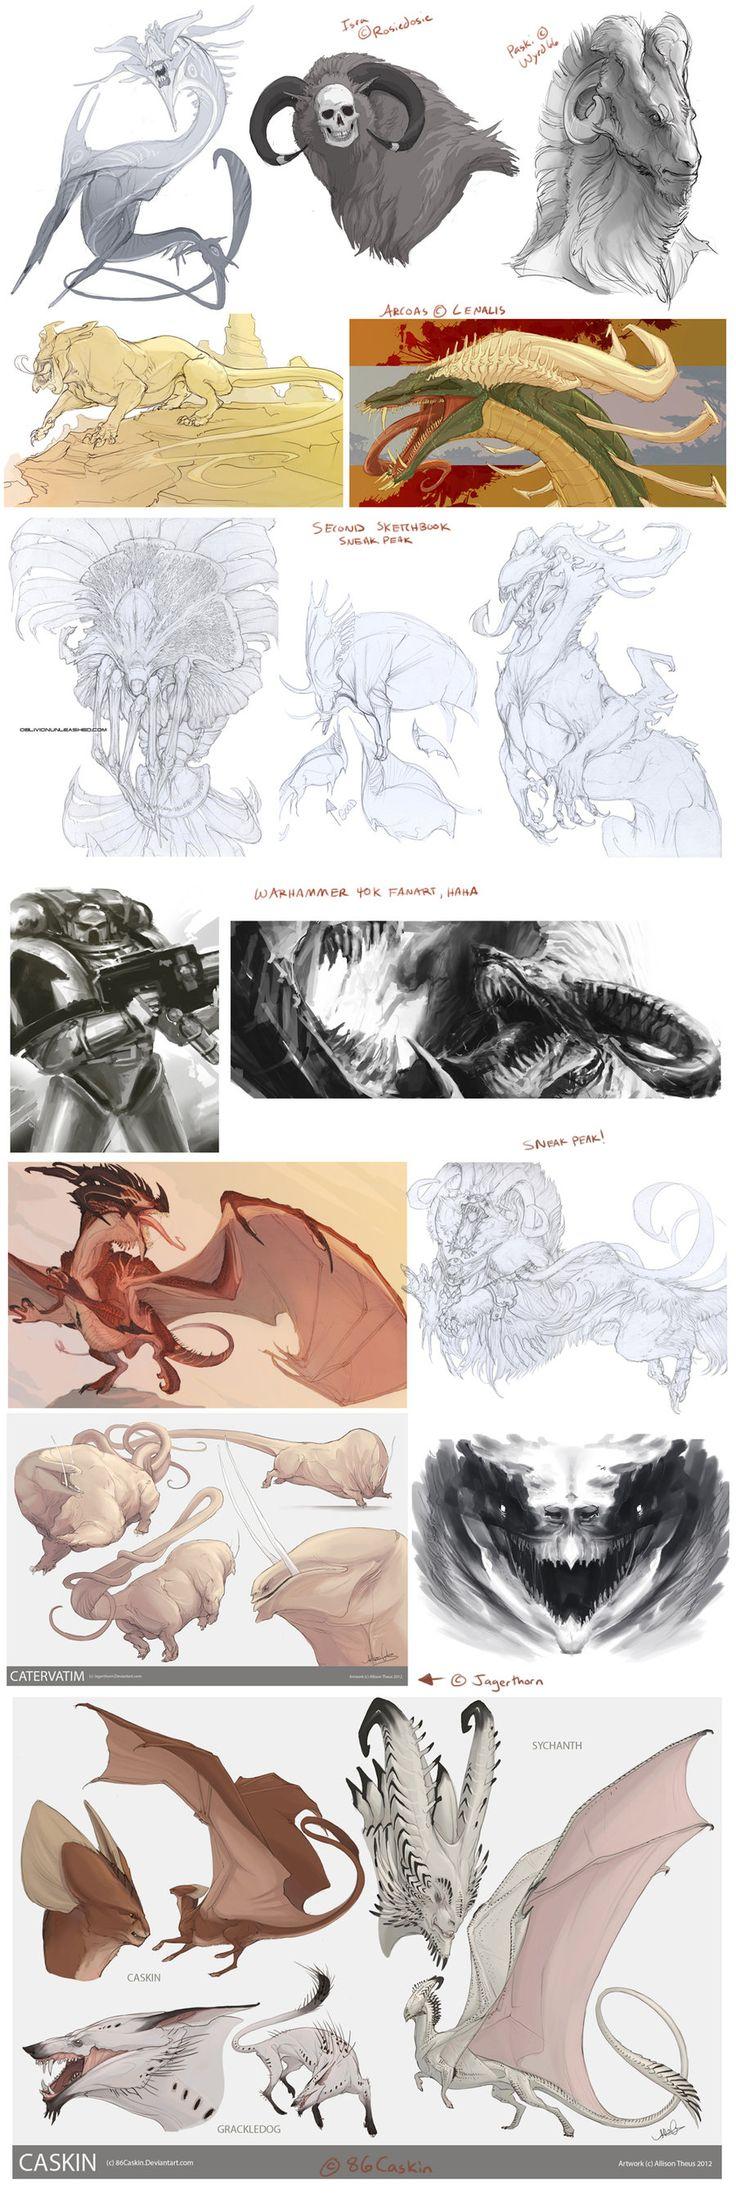 Creature Sketchdump 2 by beastofoblivion on deviantART via PinCG.com